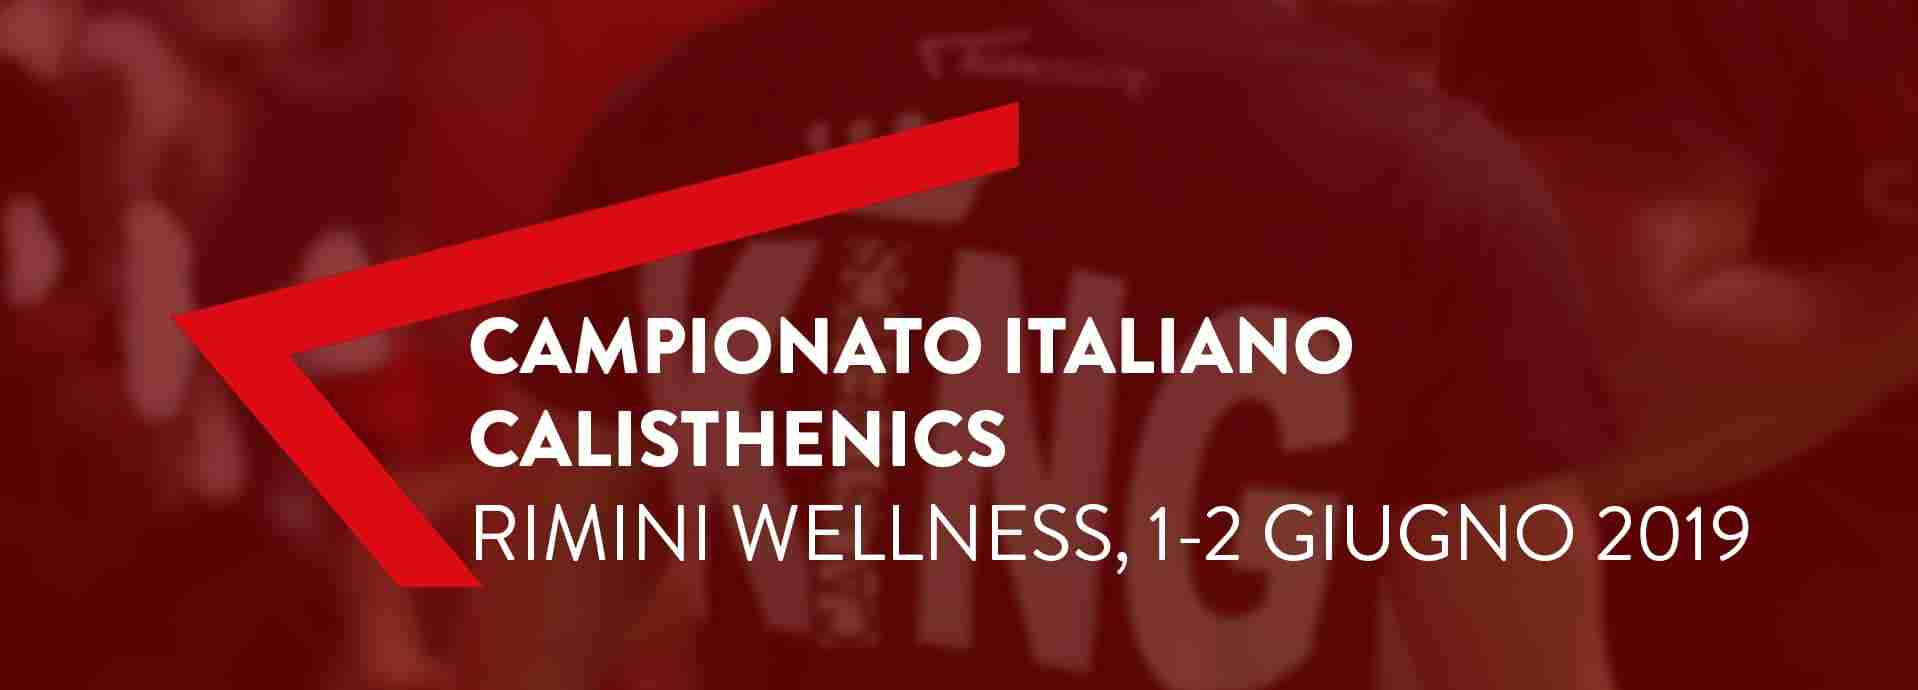 campionato-italiano-calisthenics